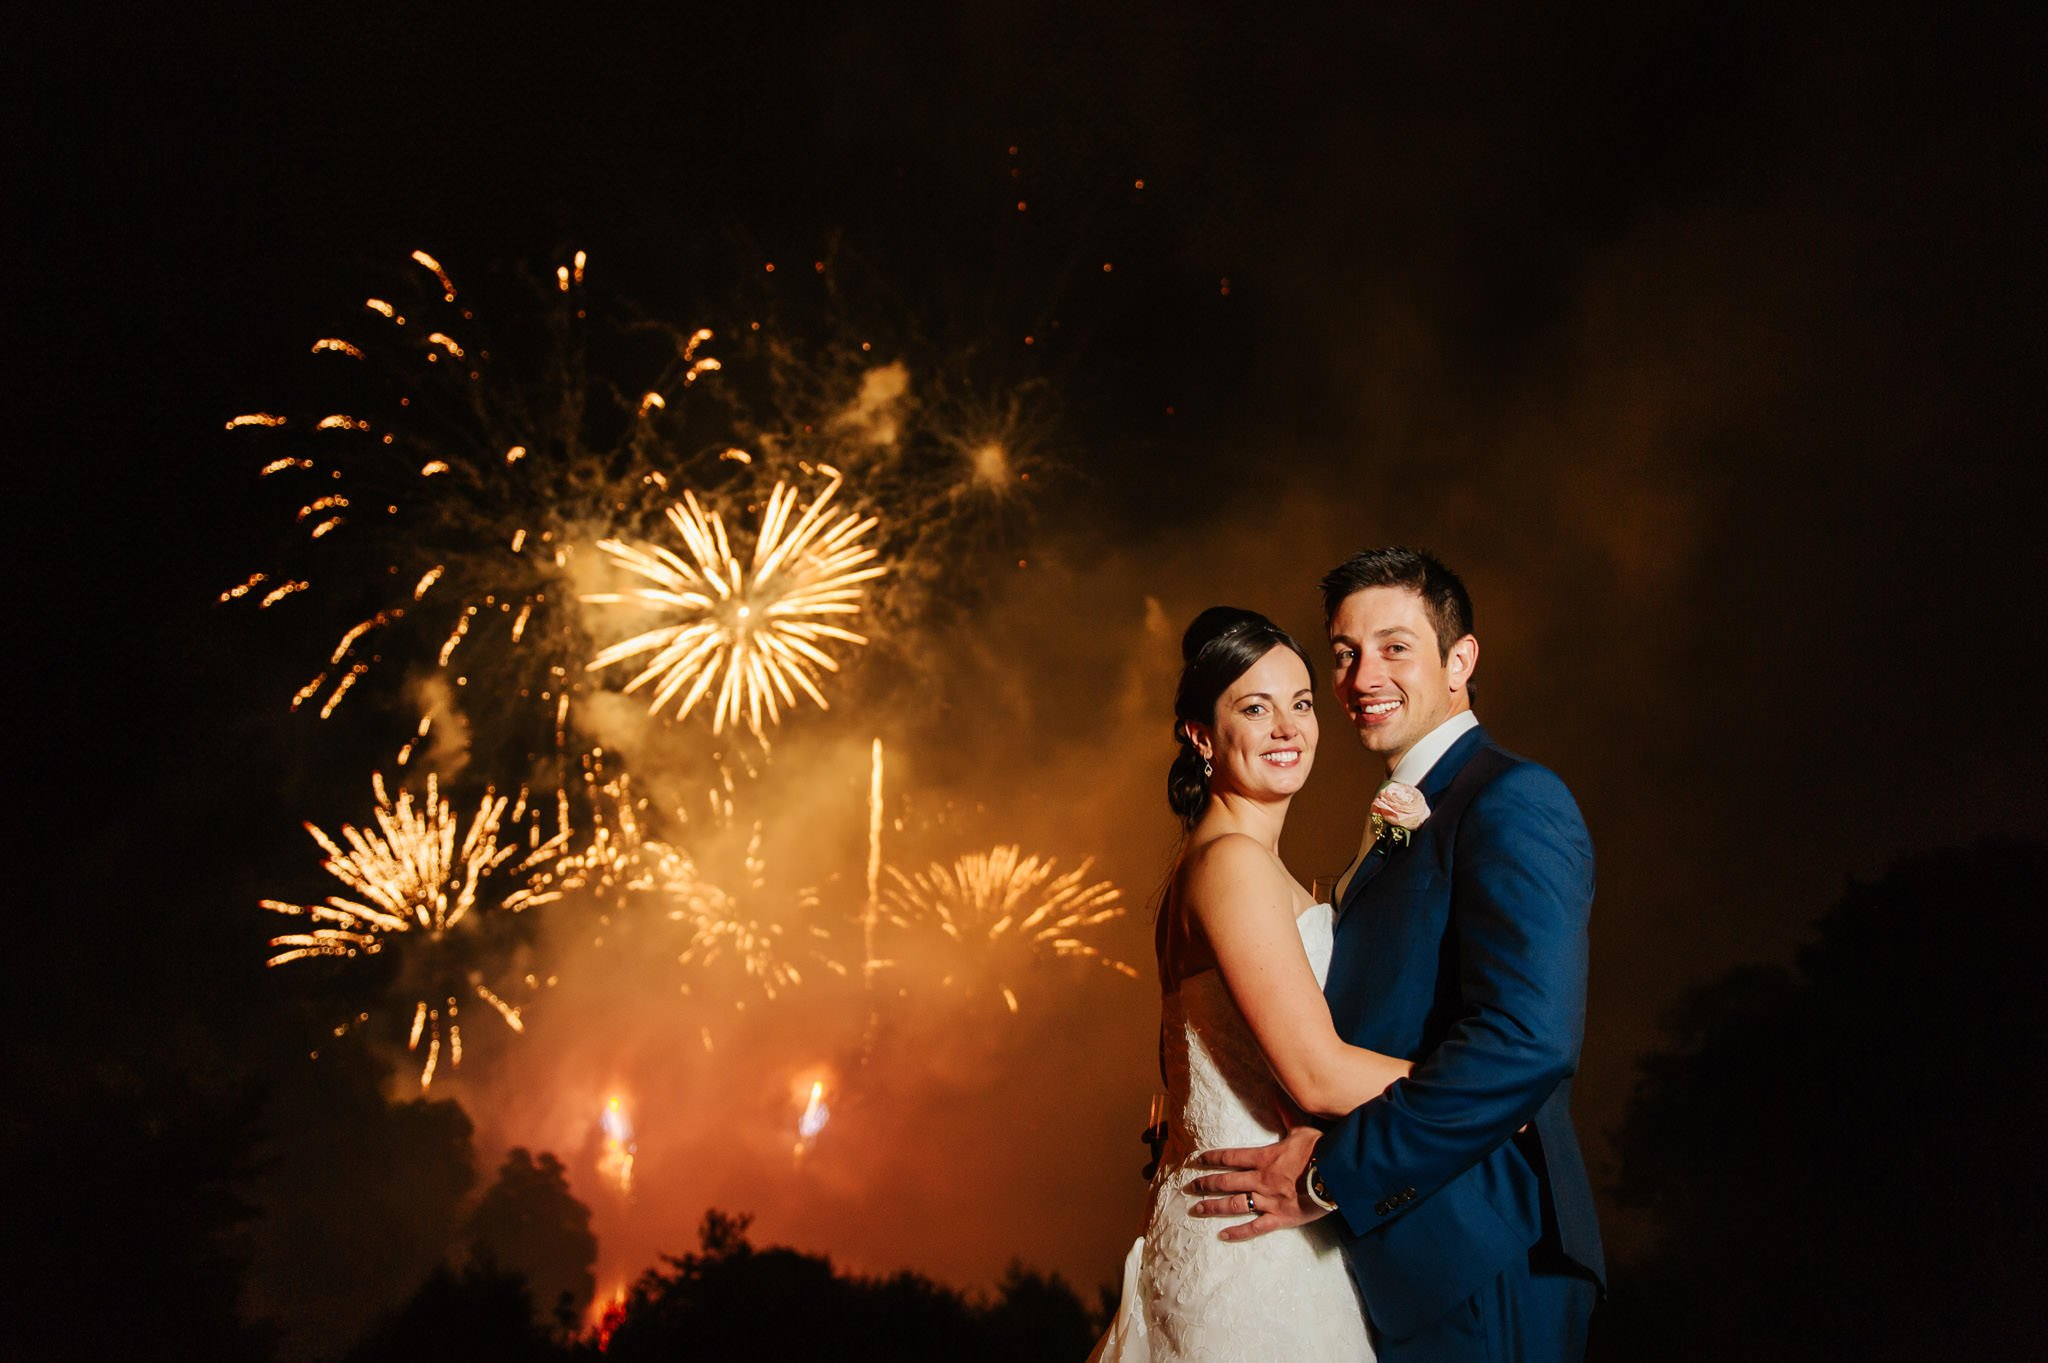 Eastnor Castle wedding photographer Herefordshire, West Midlands - Sarah + Dean 70